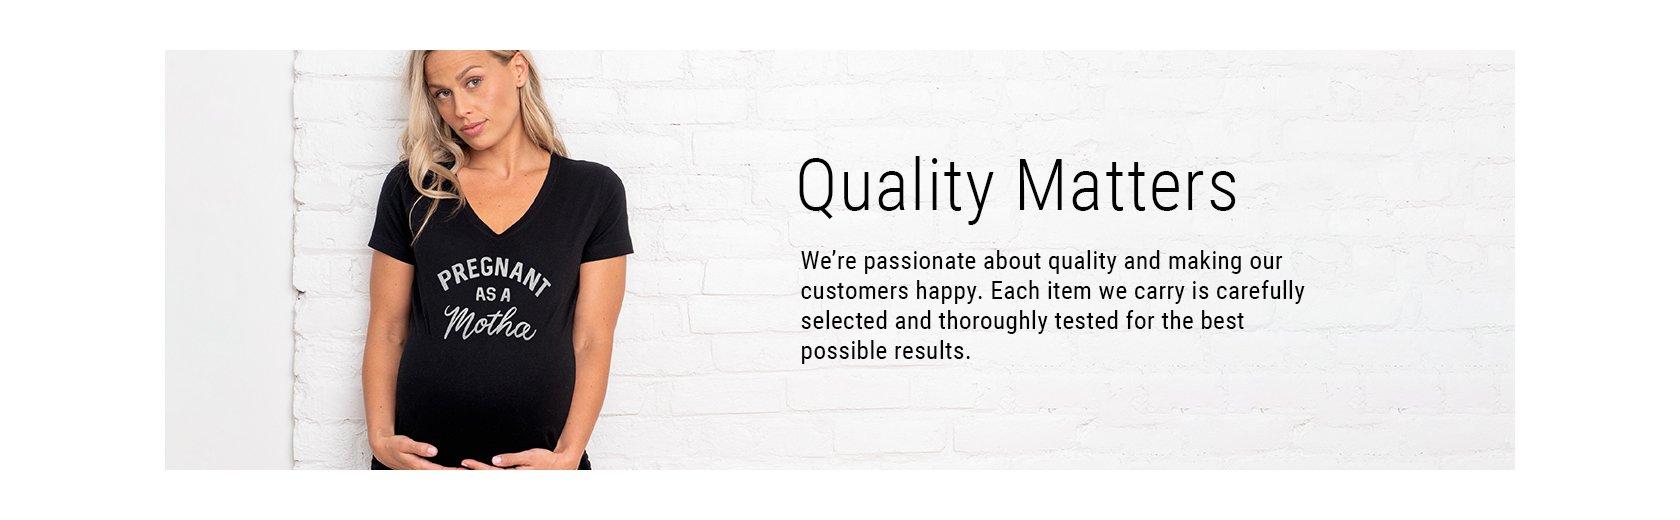 UK Women Maternity Vest Top Sleeveless Tunic Pregnancy Printed T Shirt Blouse GS